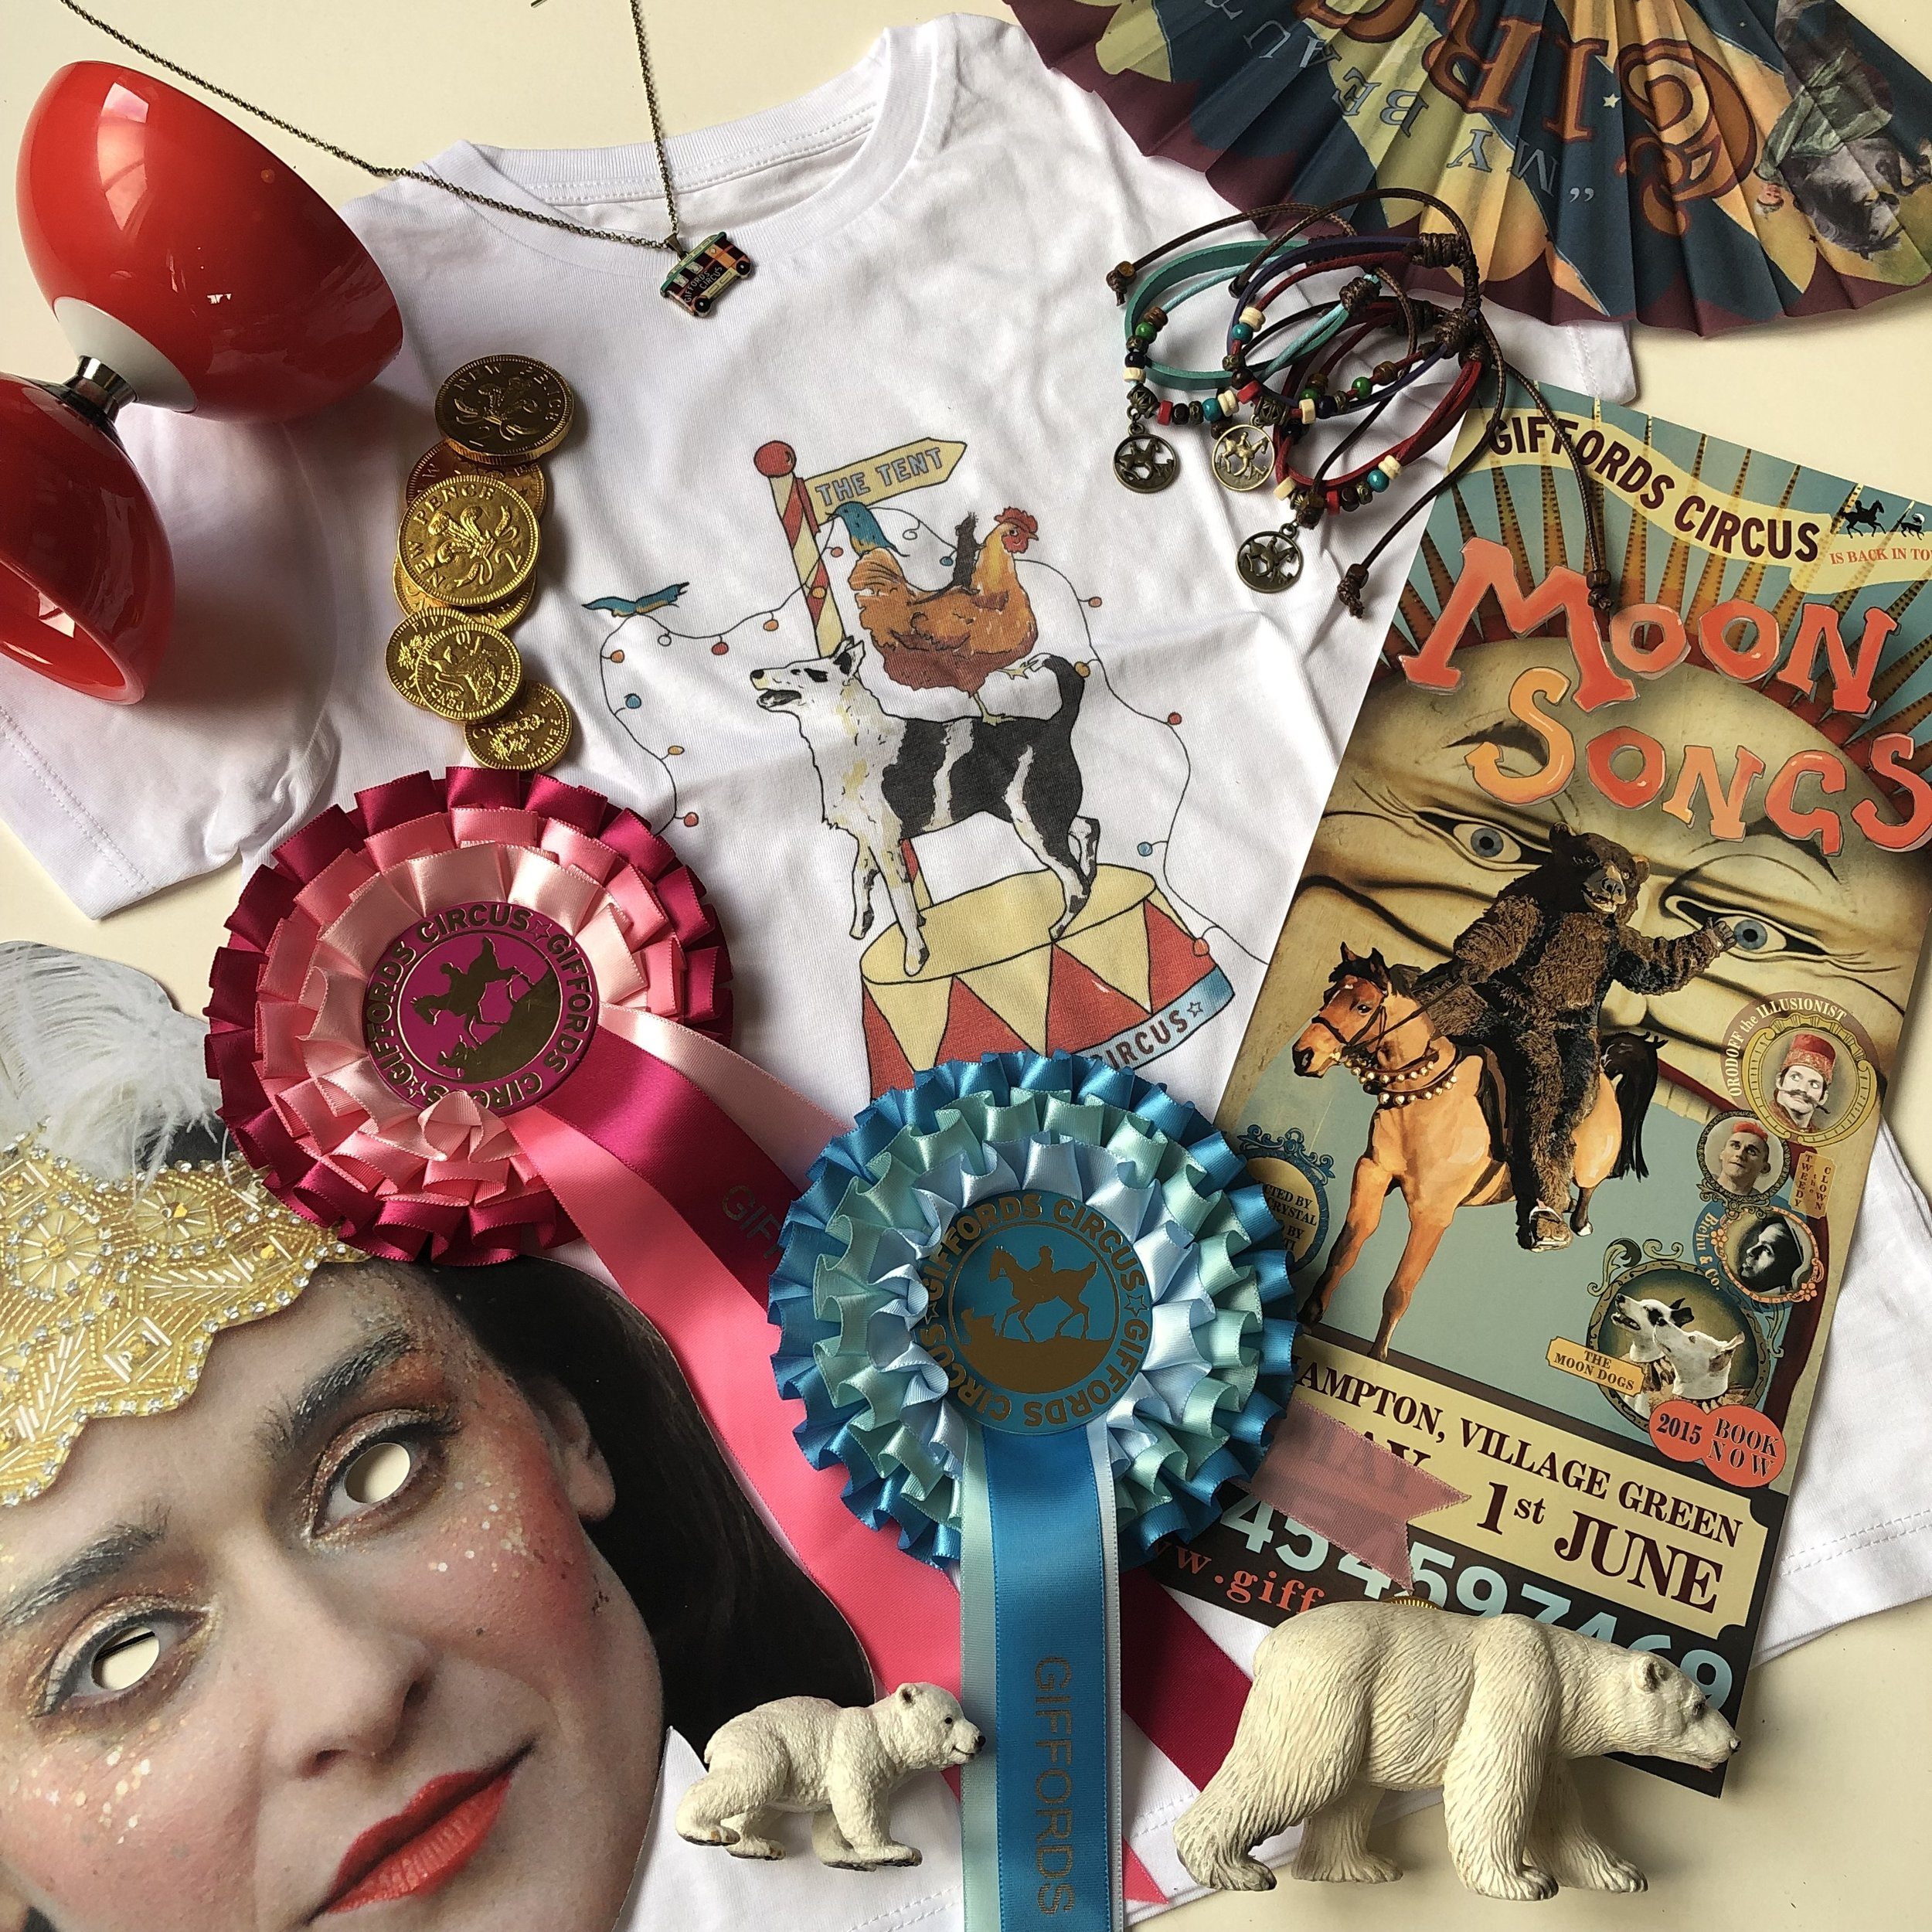 Circus t-shirt, a Nancy mask, a diabolo, posters, rosette, charm bracelets and a circus fan.